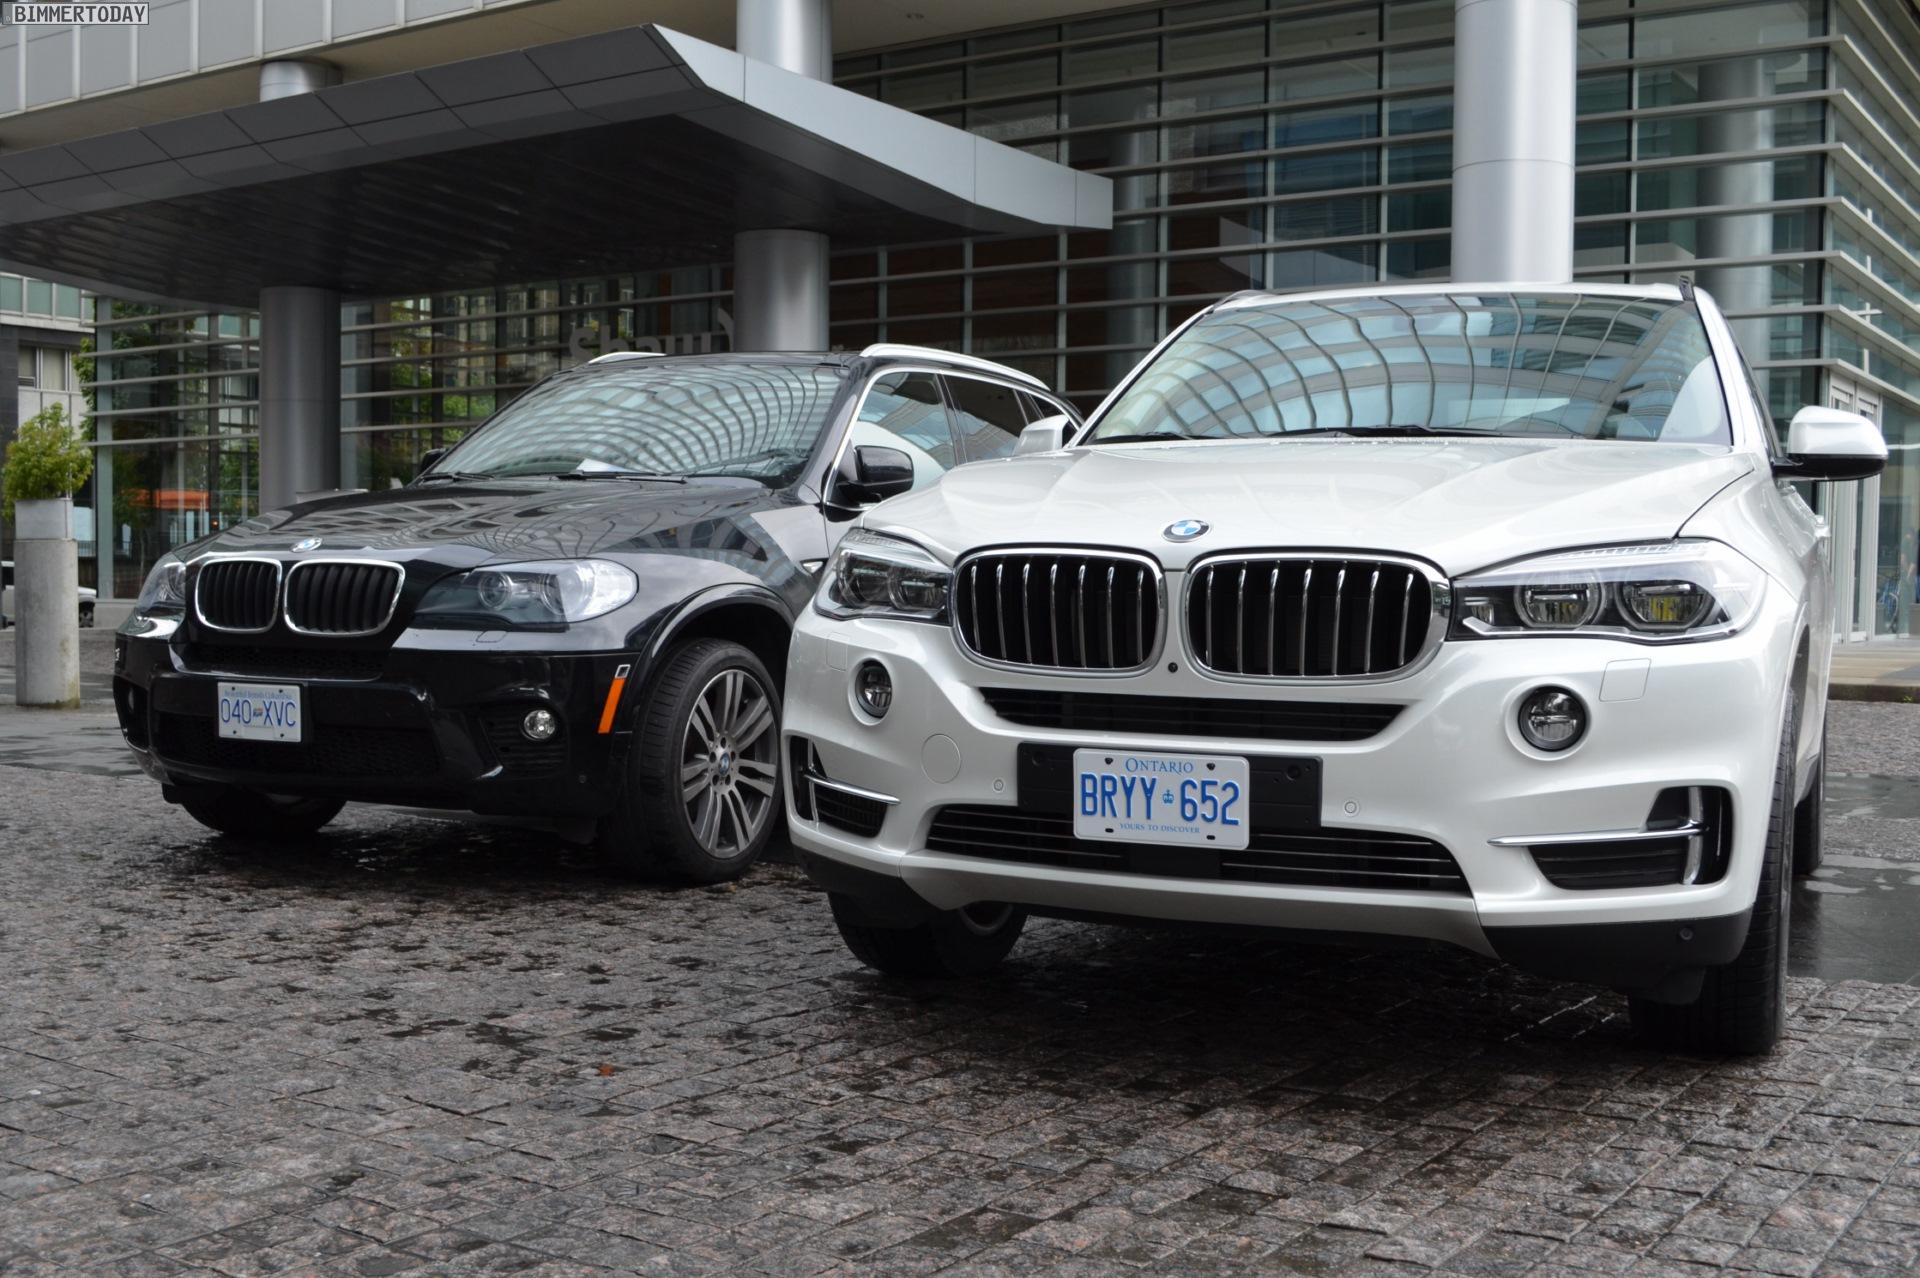 2014 BMW X5 F15 vs E70 Vergleich Foto schwarz weiss 12